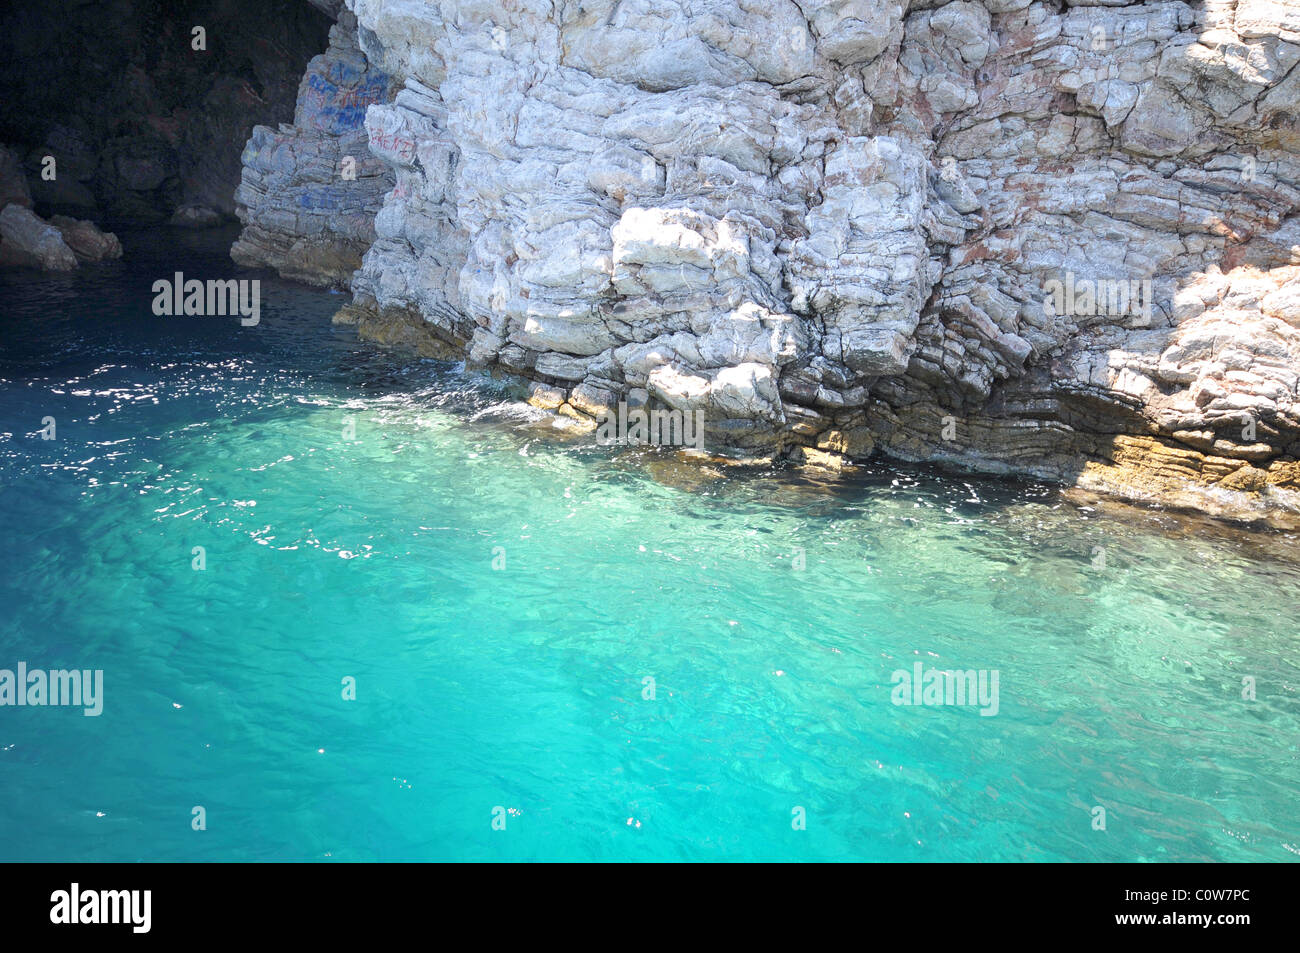 Blue-green sea waters of the Aegean sea, Turkey - Stock Image